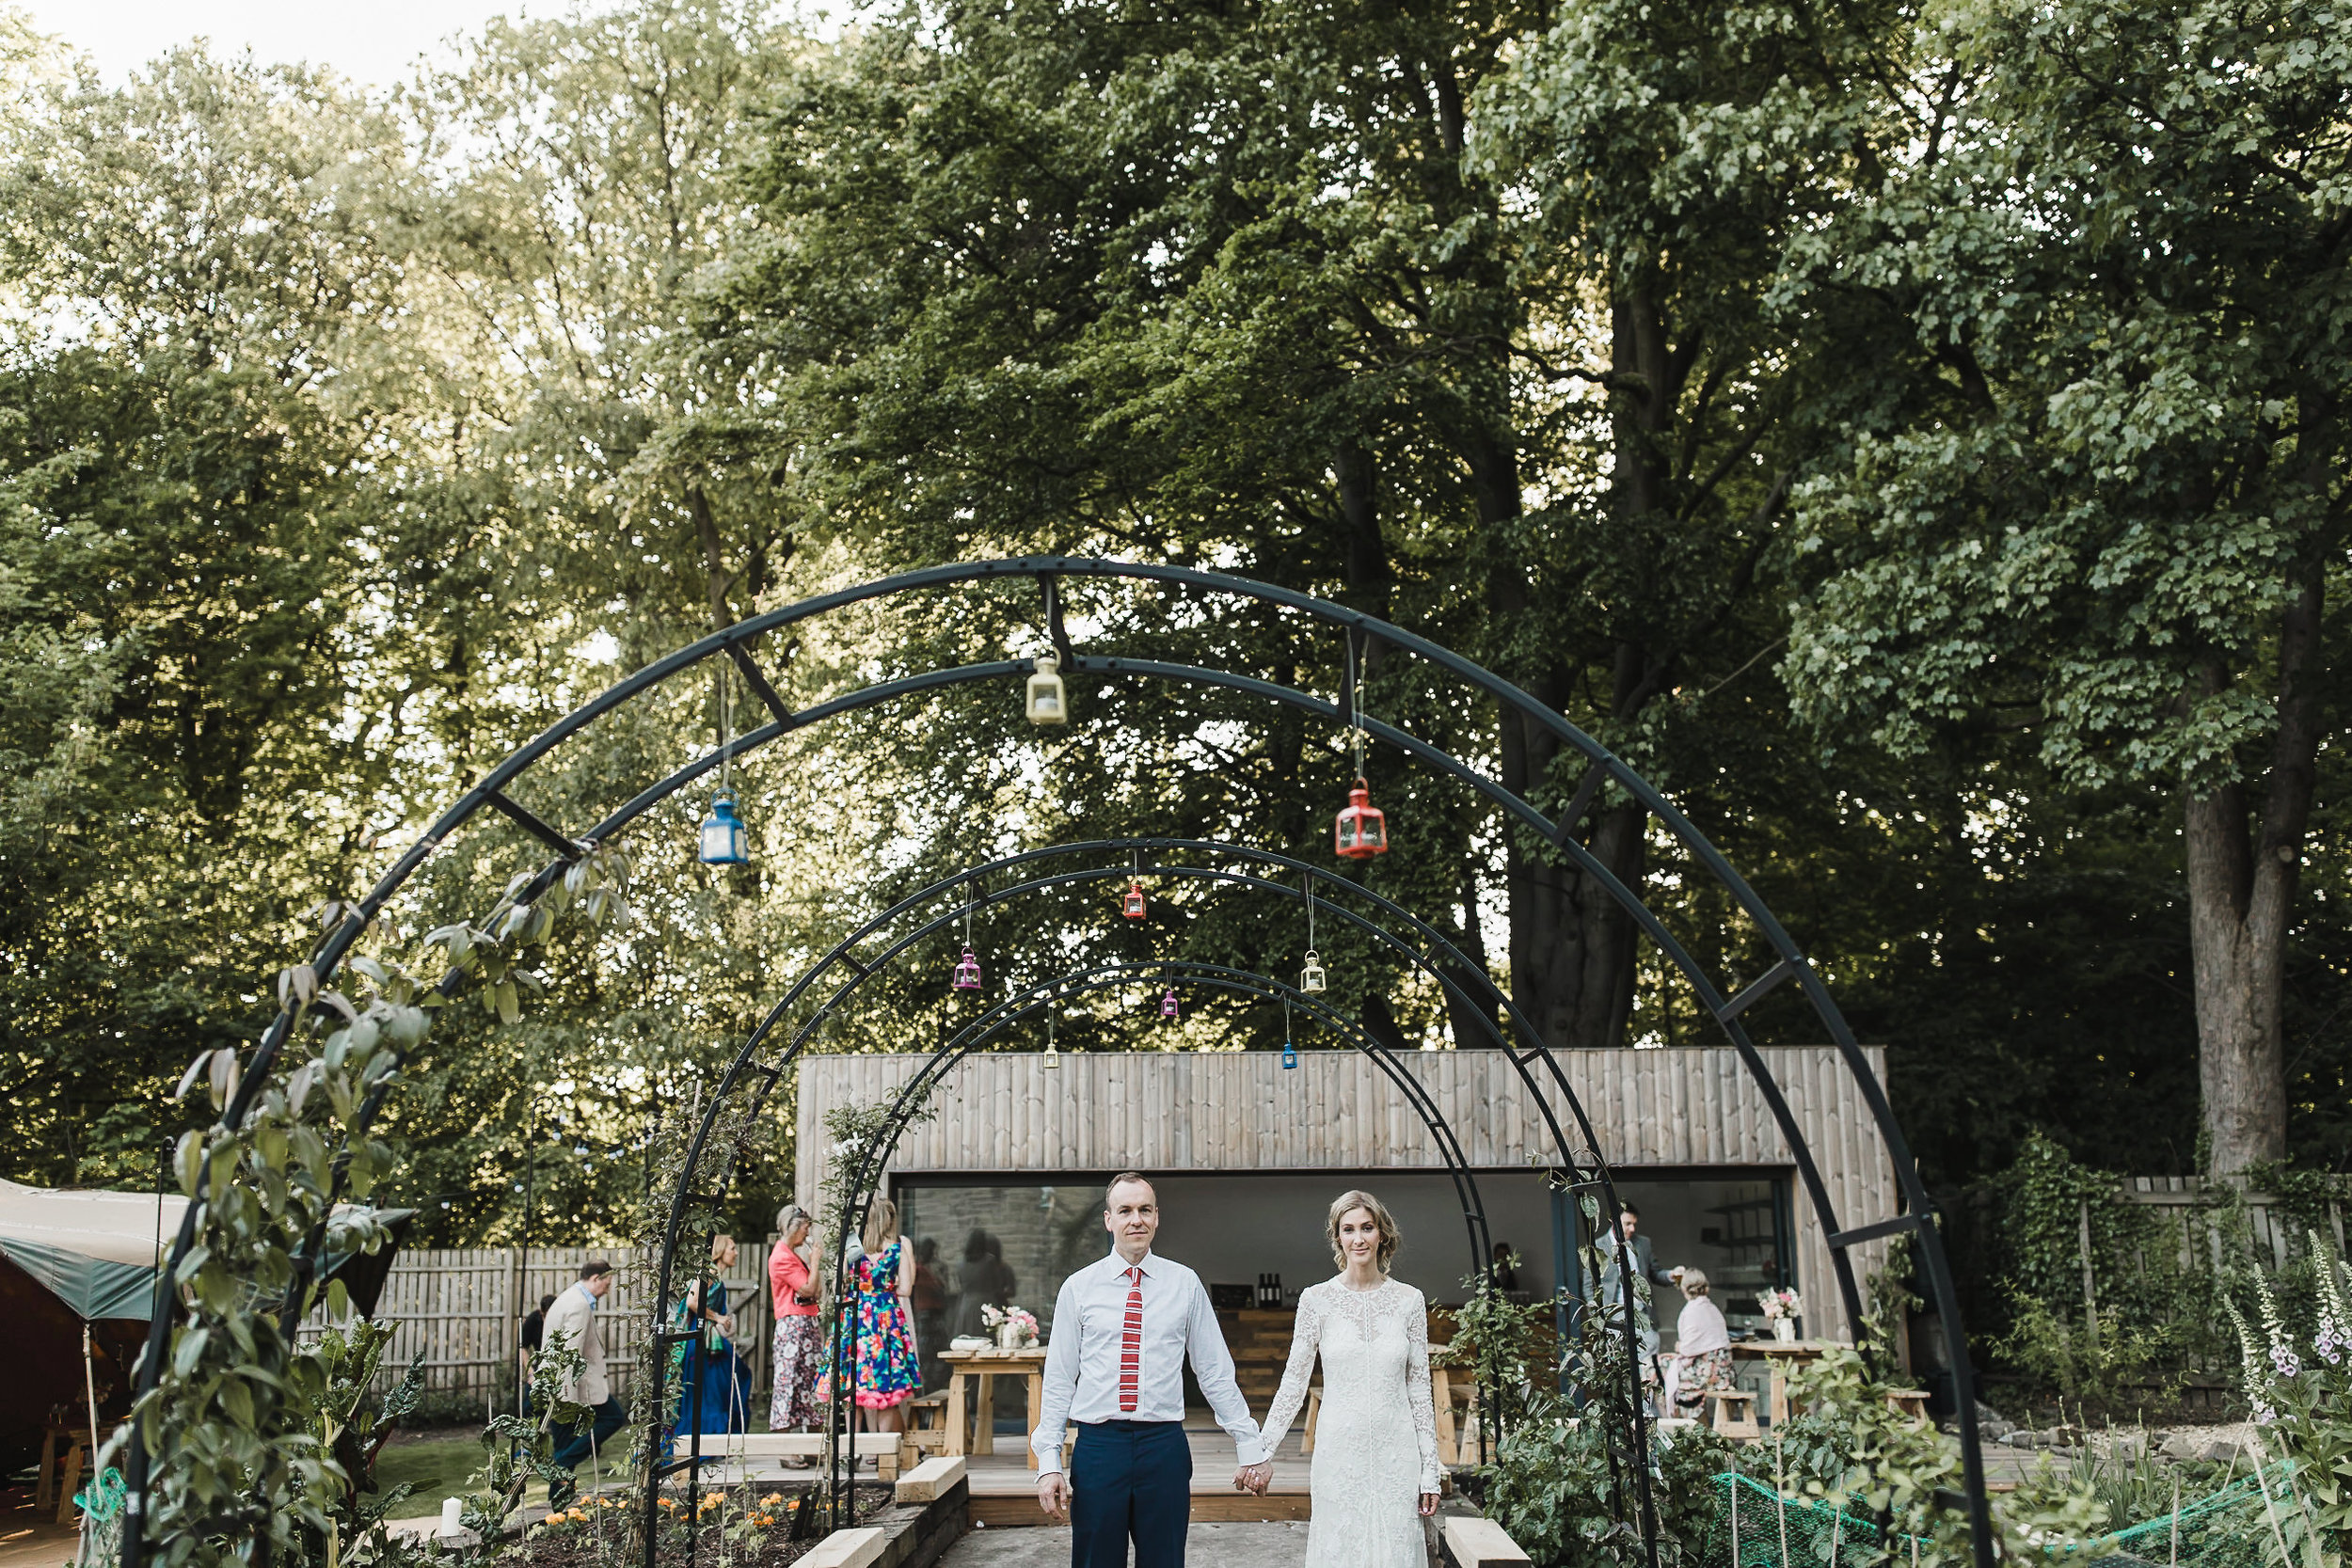 Roundhay-Leeds-Backyard-Wedding-Becs-Chris-205.jpg